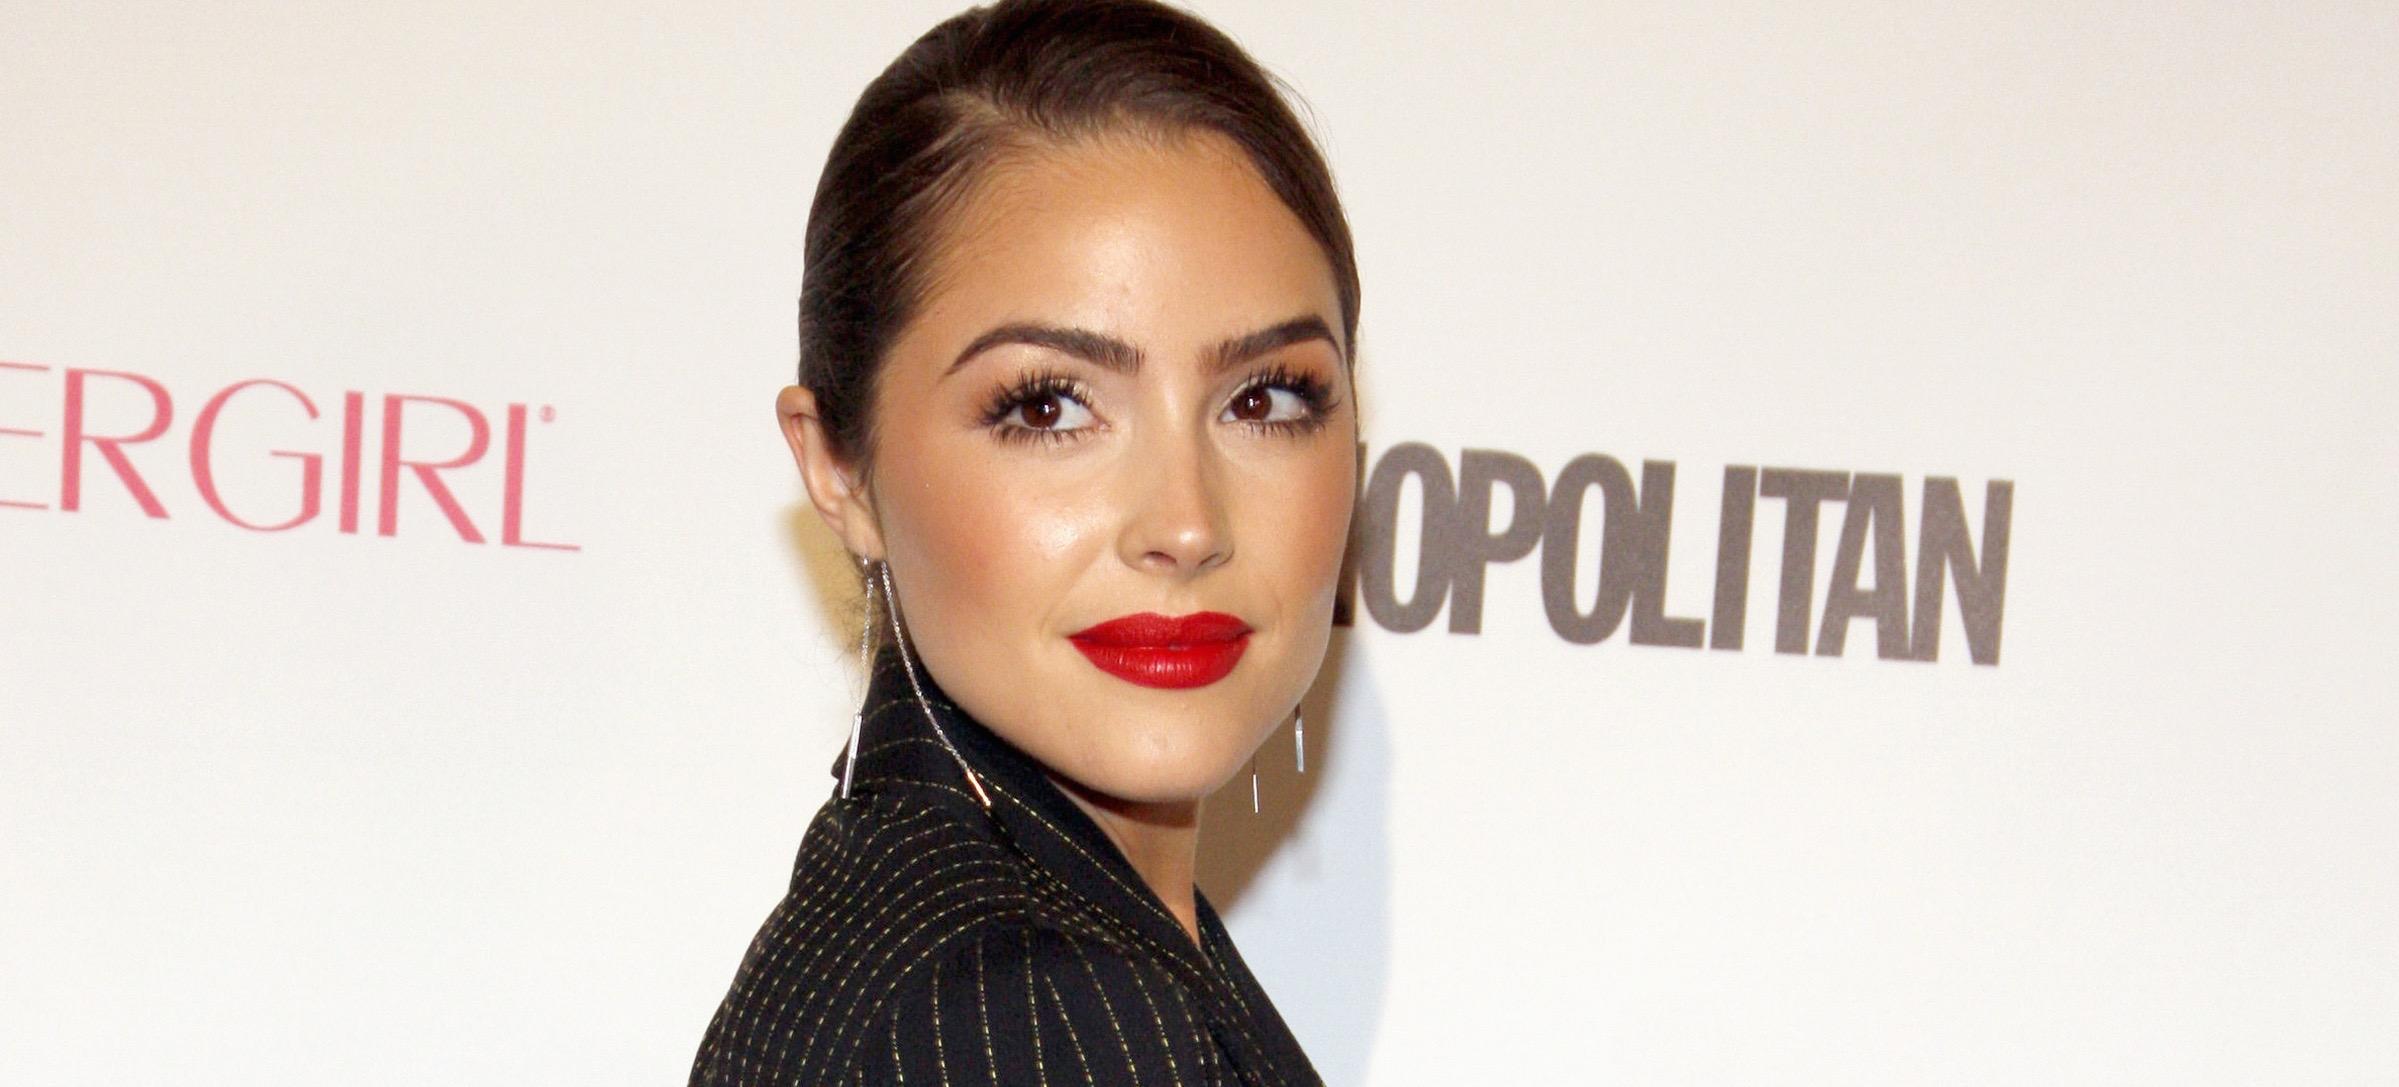 Olivia Culpo Shares Her Perfect Brow Secrets